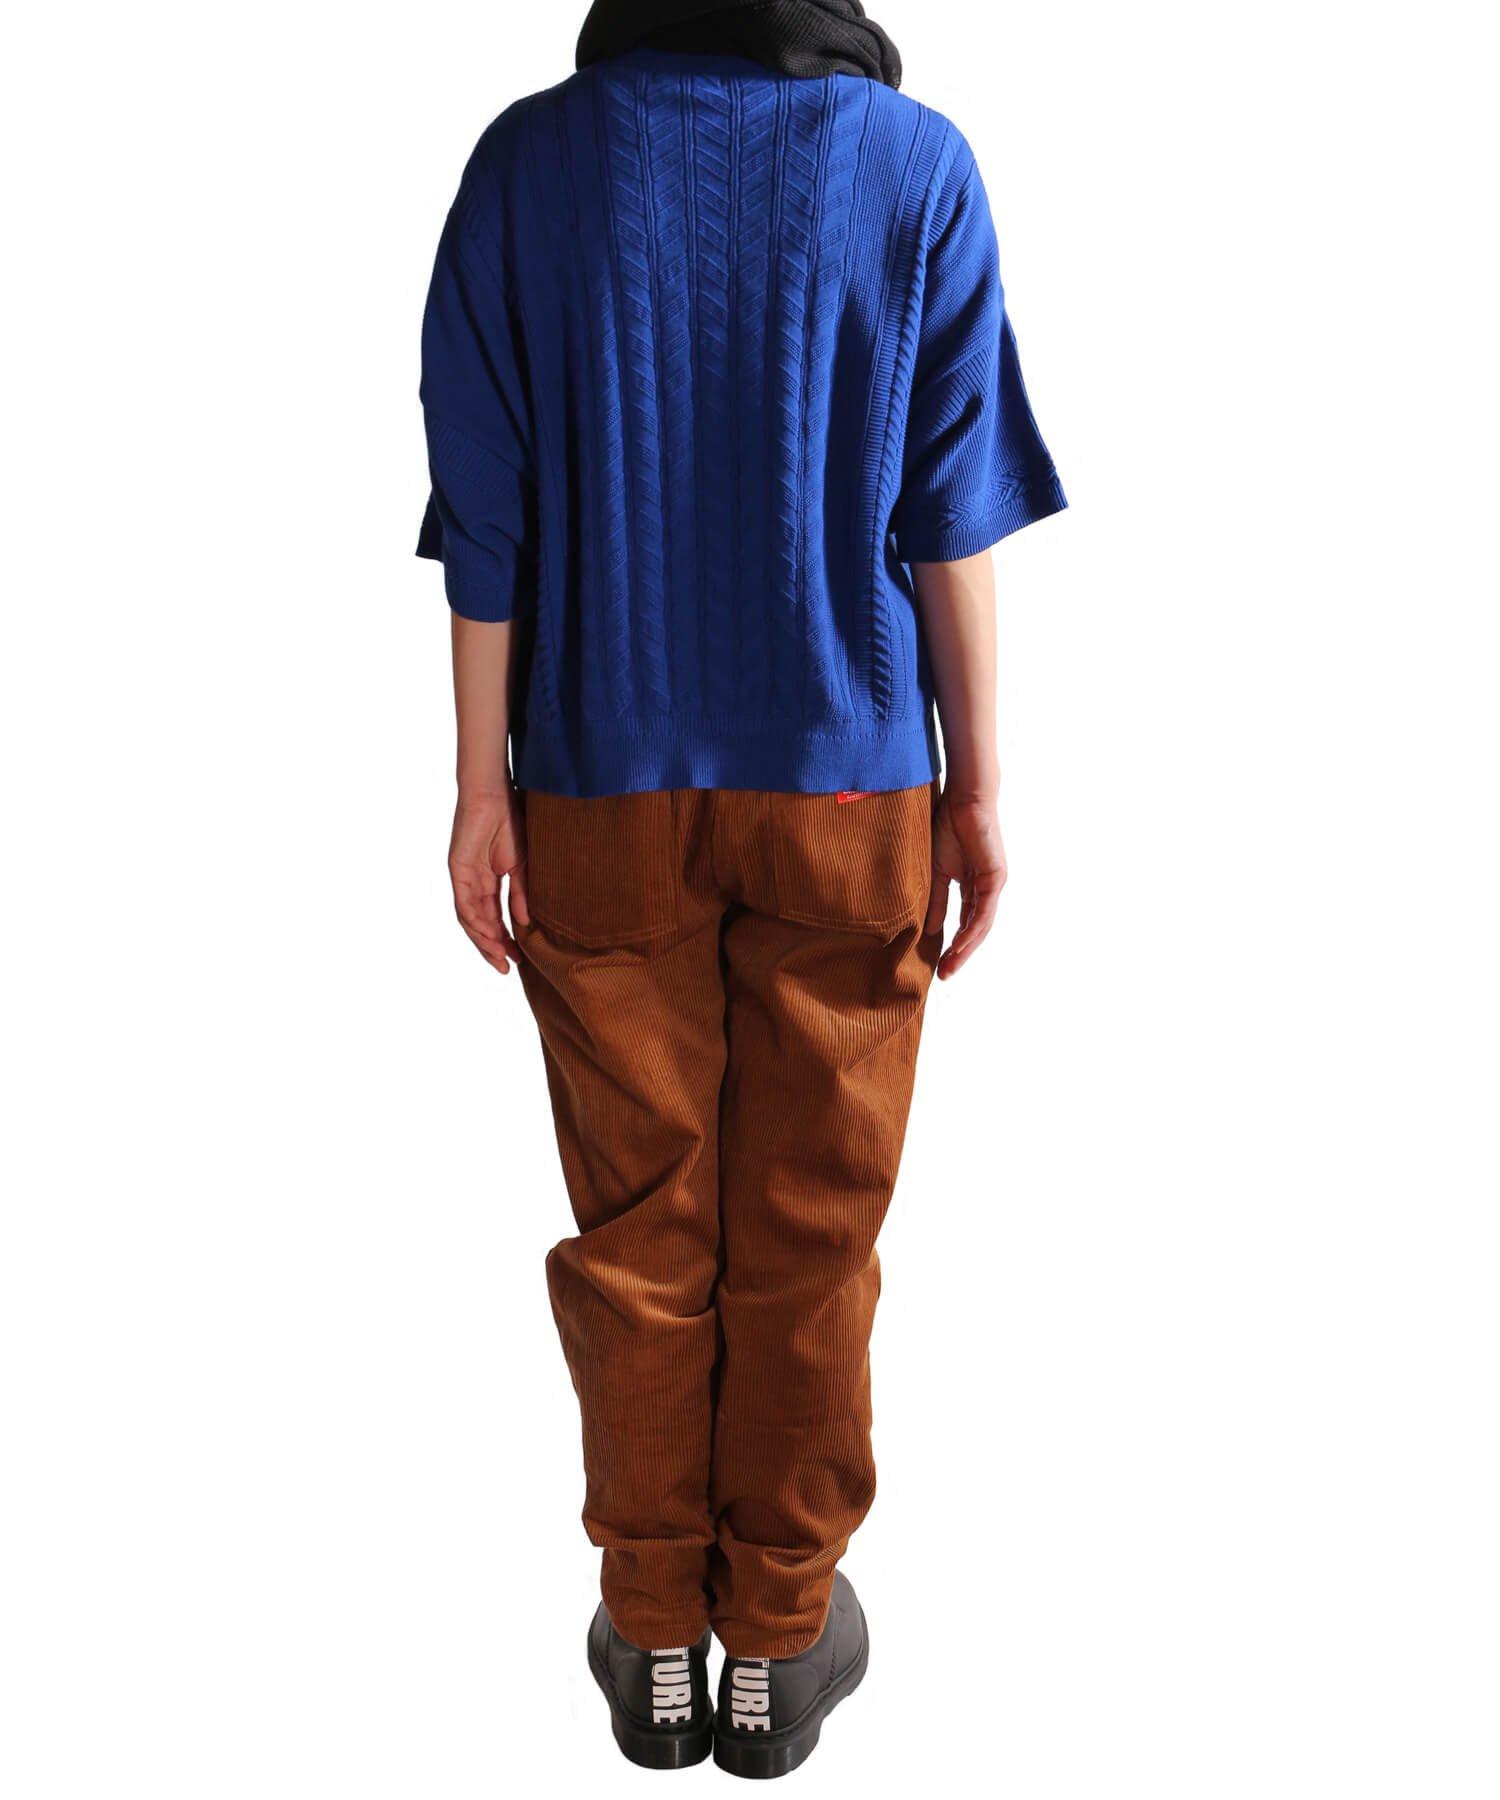 YASHIKI / ヤシキ |YASHIKI / ヤシキ × SIDEMILITIA inc. / サイドミリティア  RYUREI KNIT (LIMITED BLUE/WOMEN'S) 商品画像12